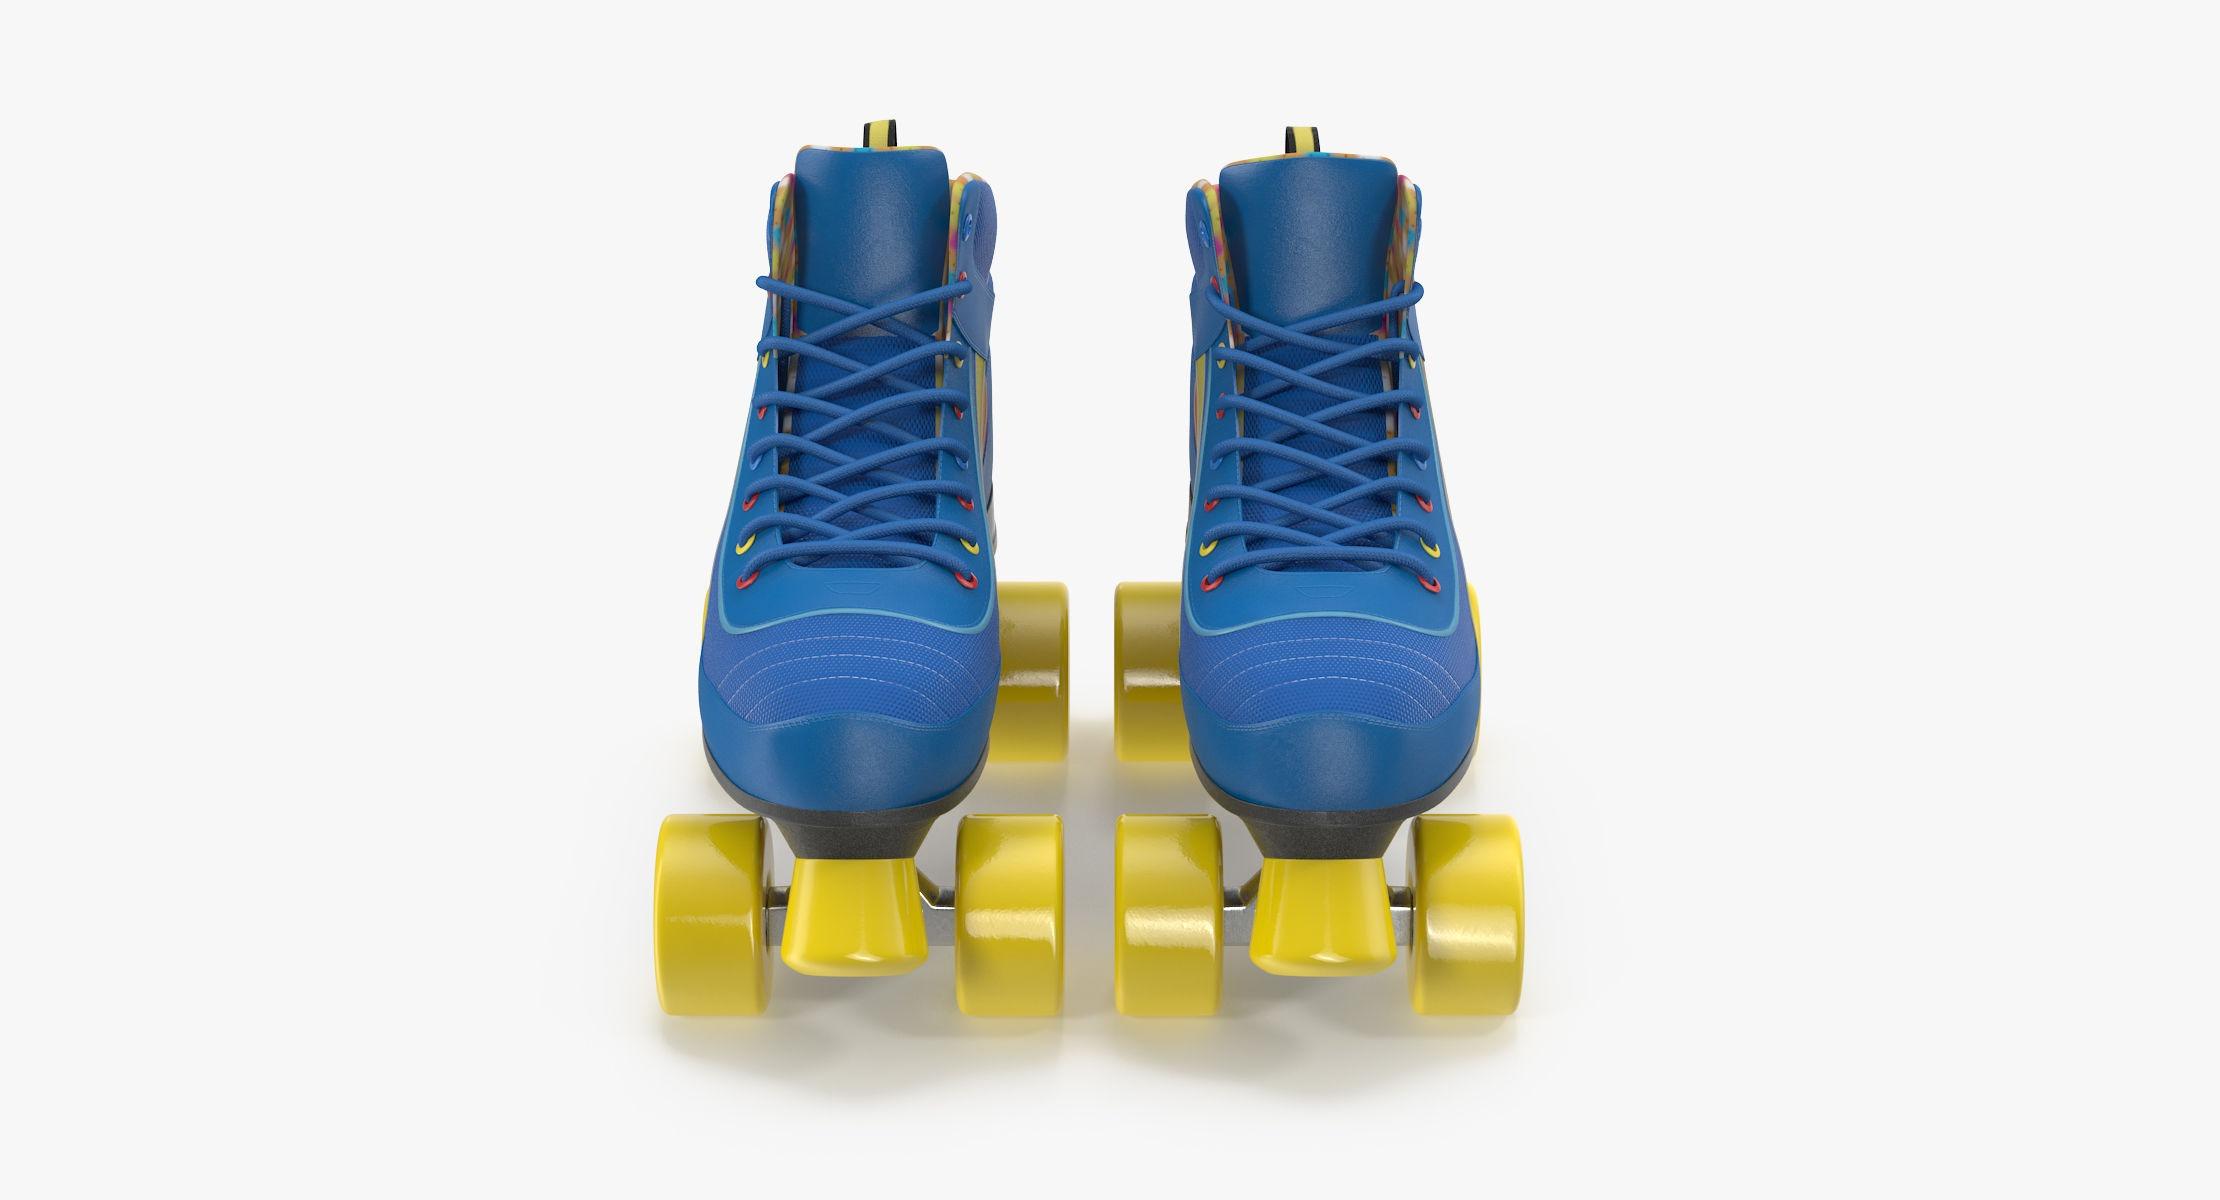 Roller Skates 02 - reel 1